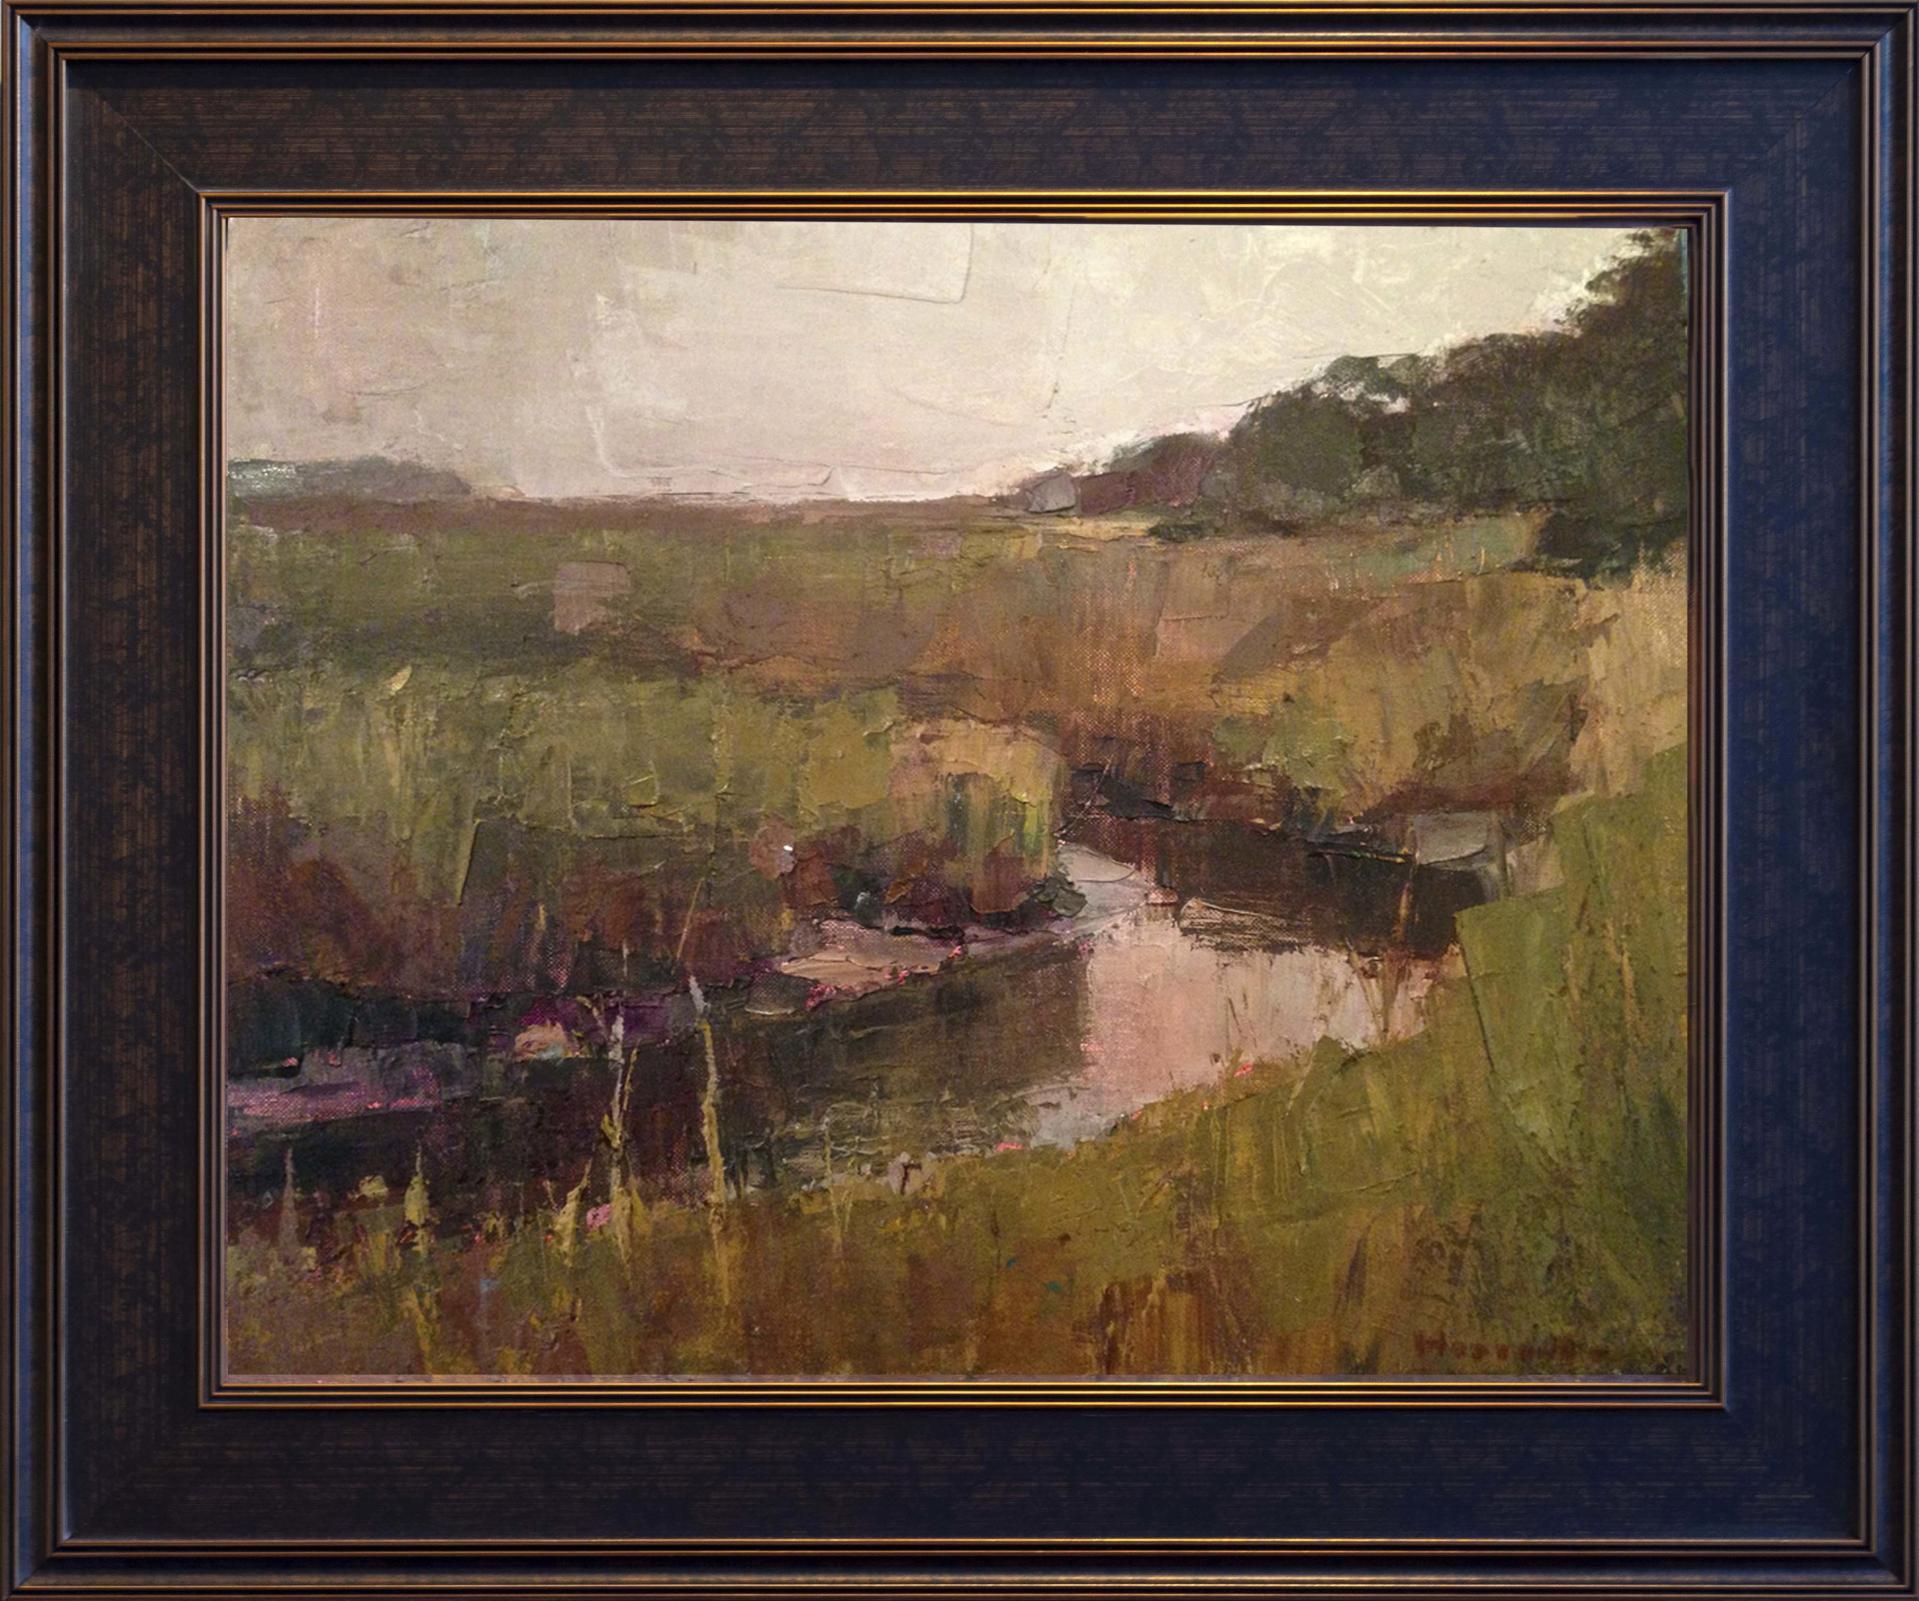 Marsh in Ochre Tones by Larry Horowitz